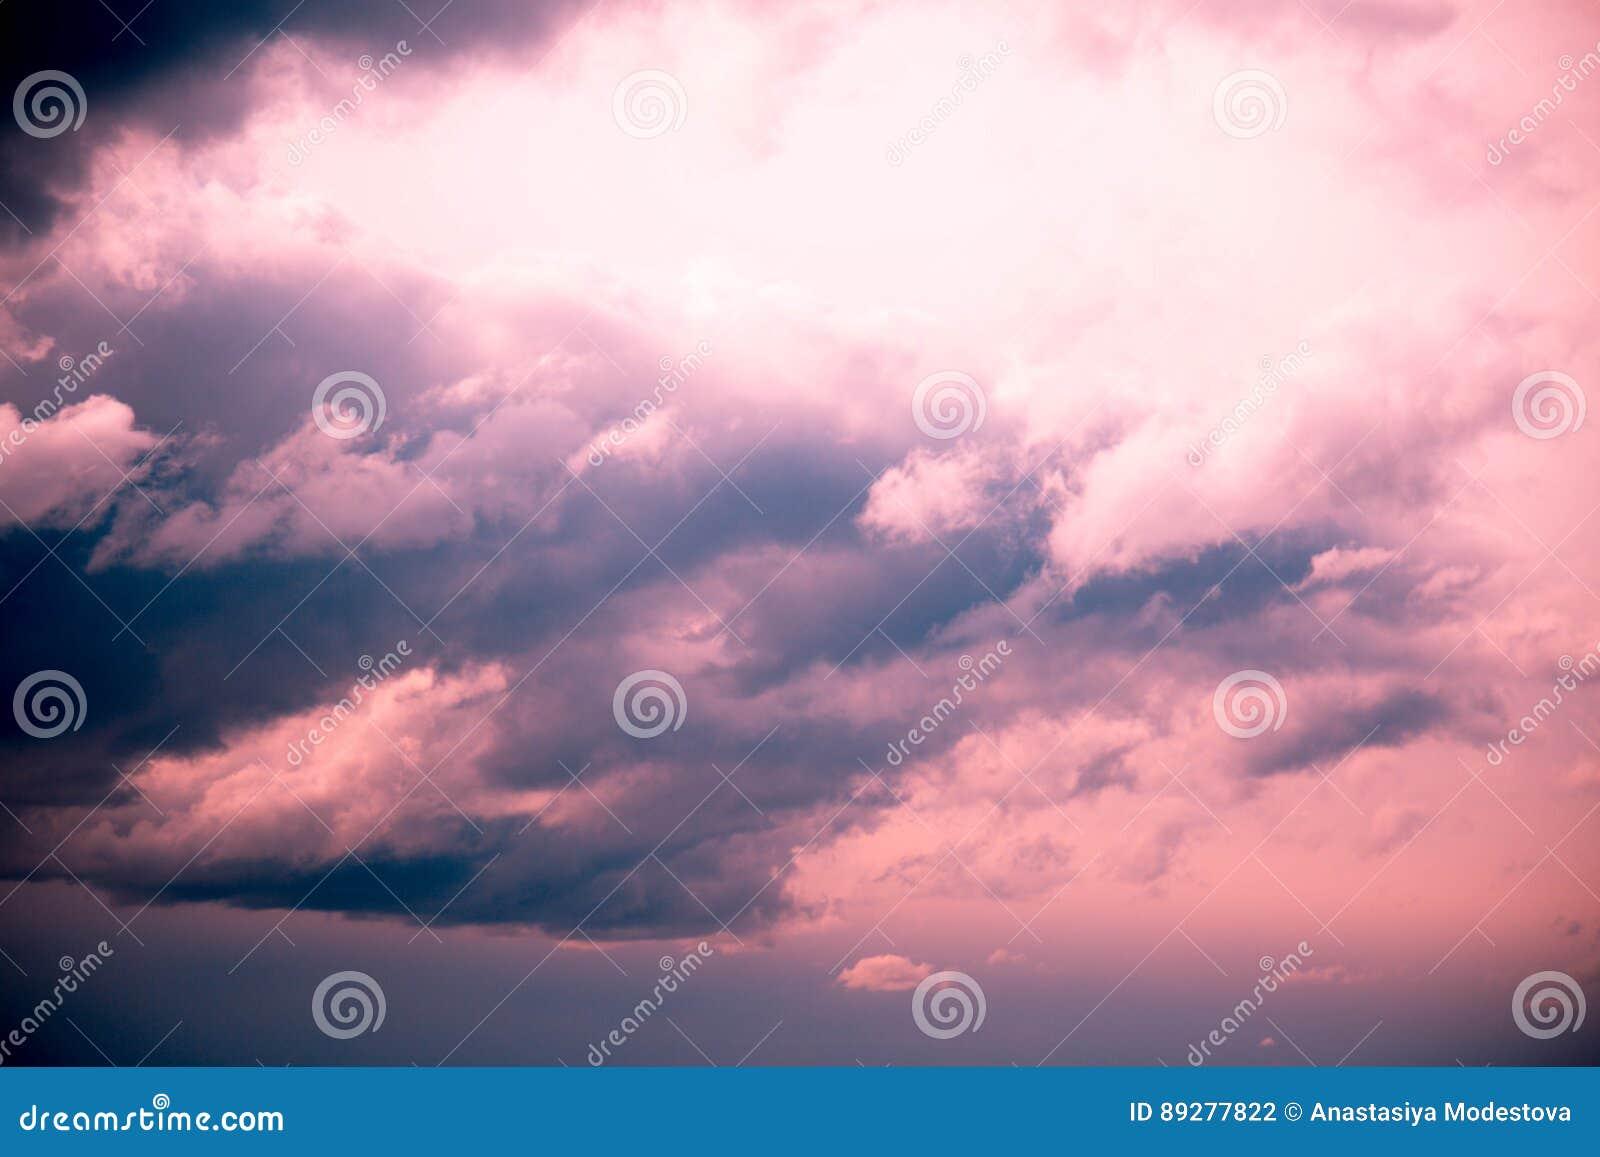 Sky sunset pink blue clouds